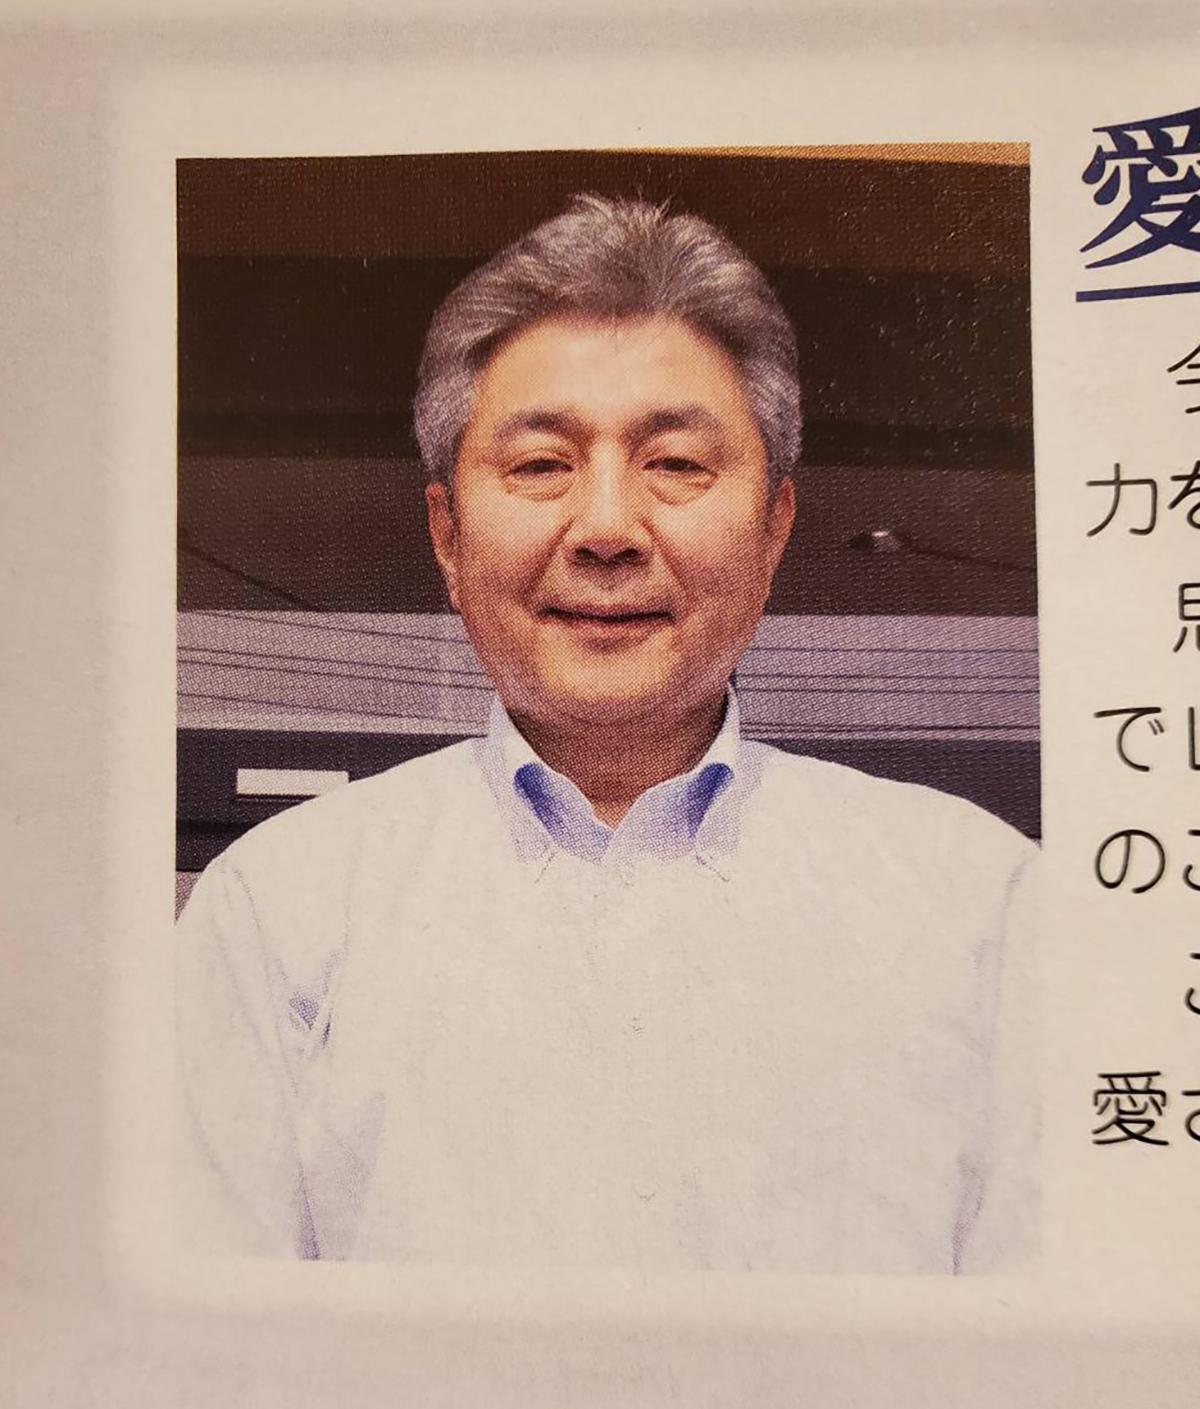 B'z稲葉浩志の兄・稲葉伸次さんの写真